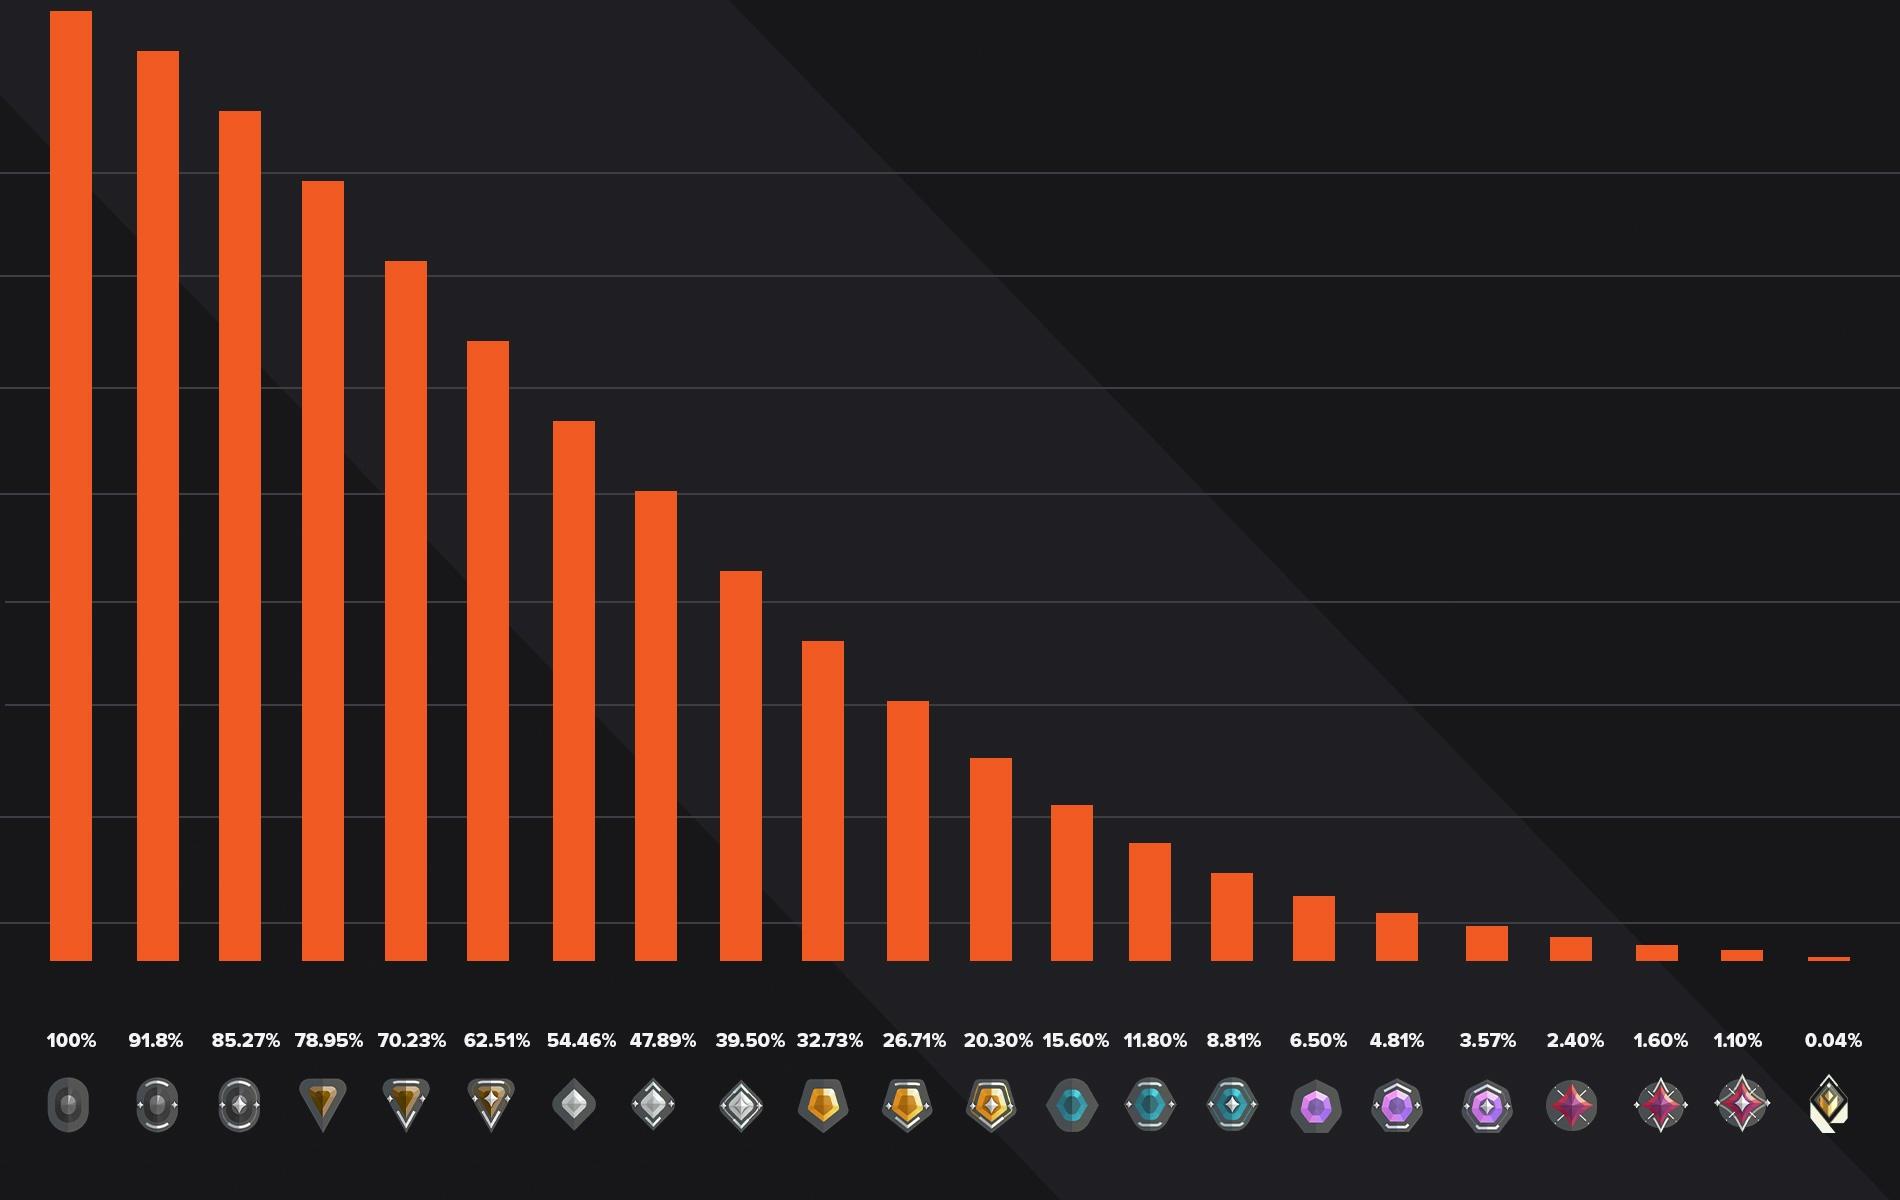 Valorant Ranked Distribution